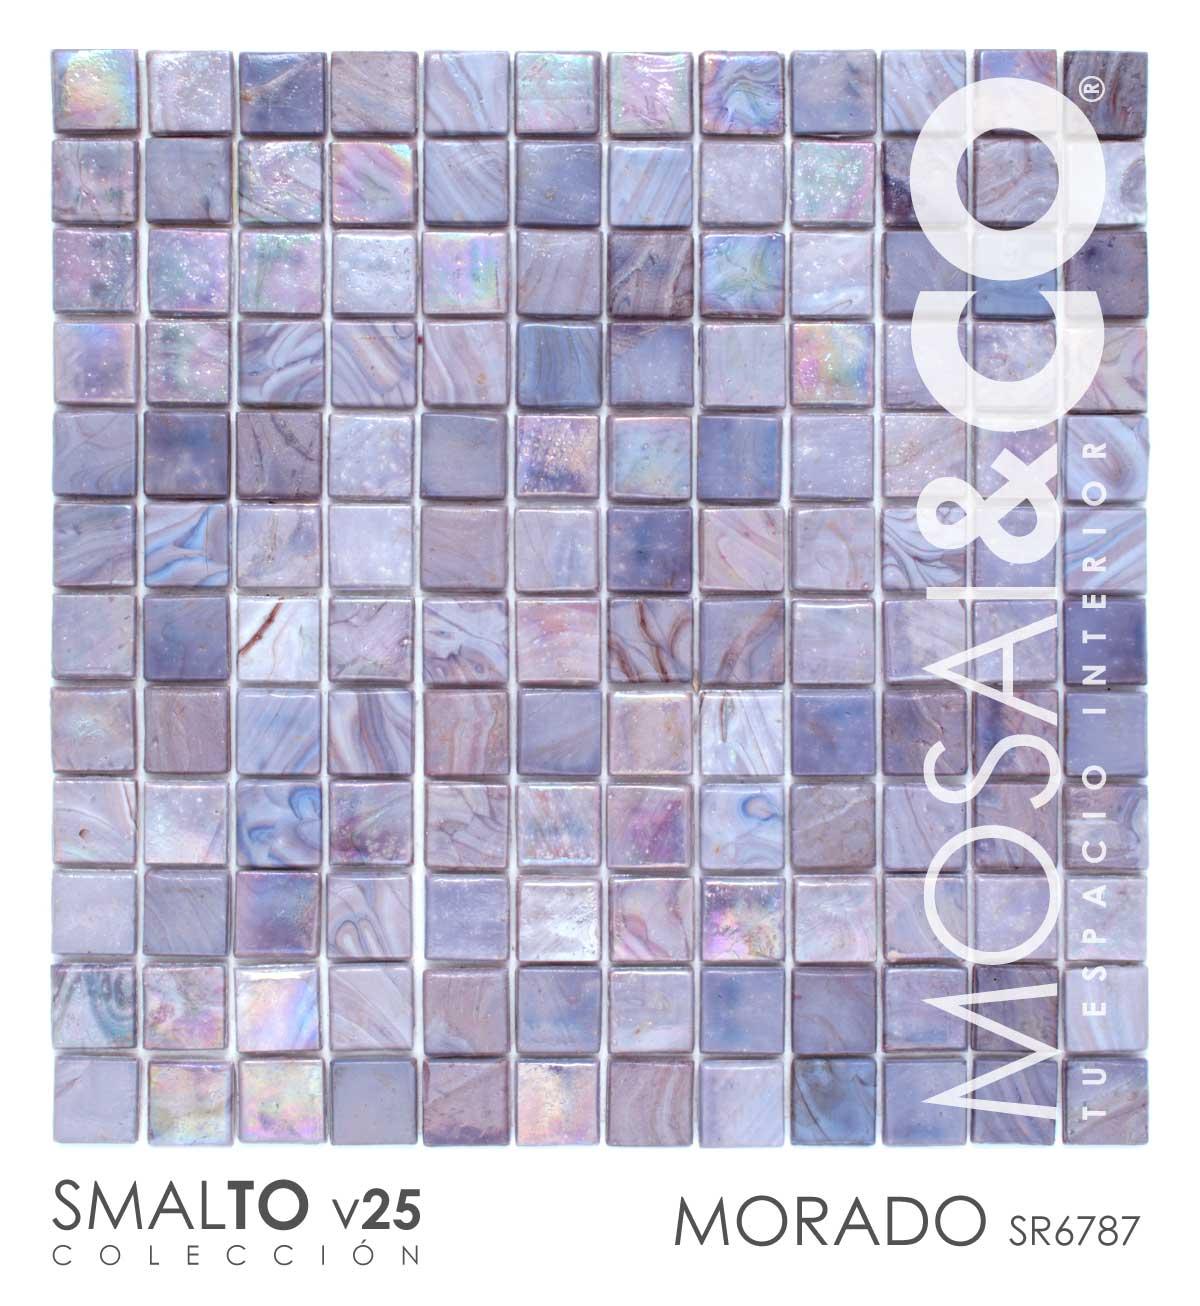 mosaico-interiores-mosaiandco-smalto-v25-morado-sr6787